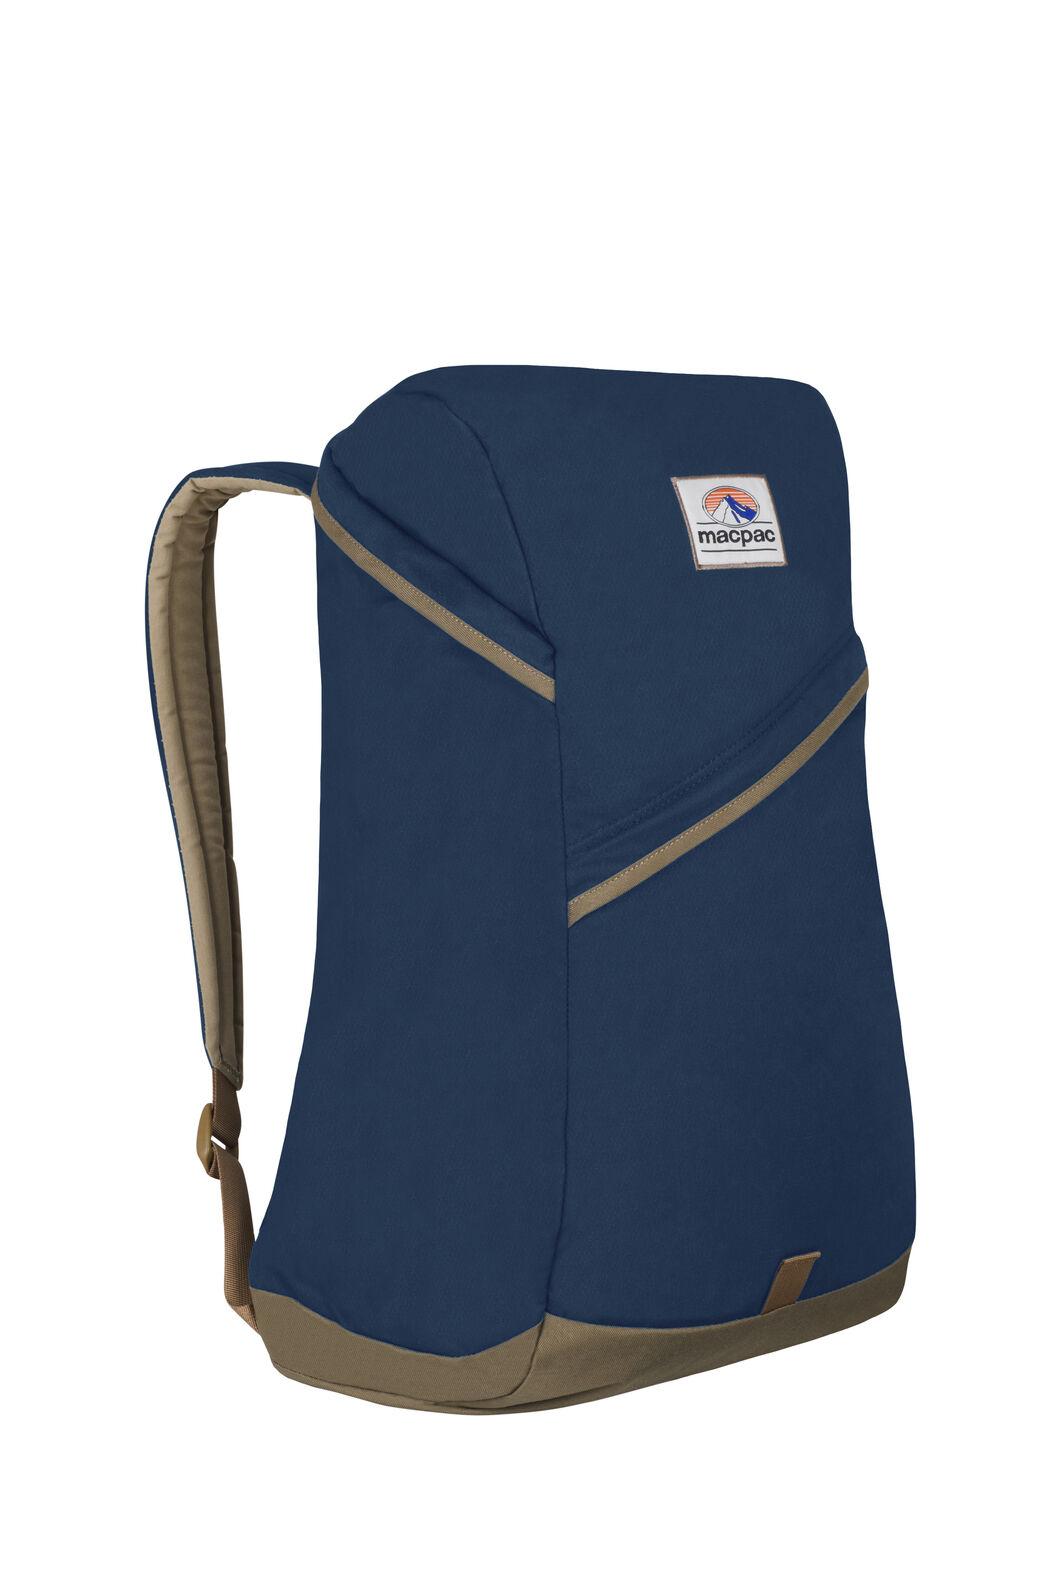 Macpac Falcon Pack, Dusky Blue, hi-res